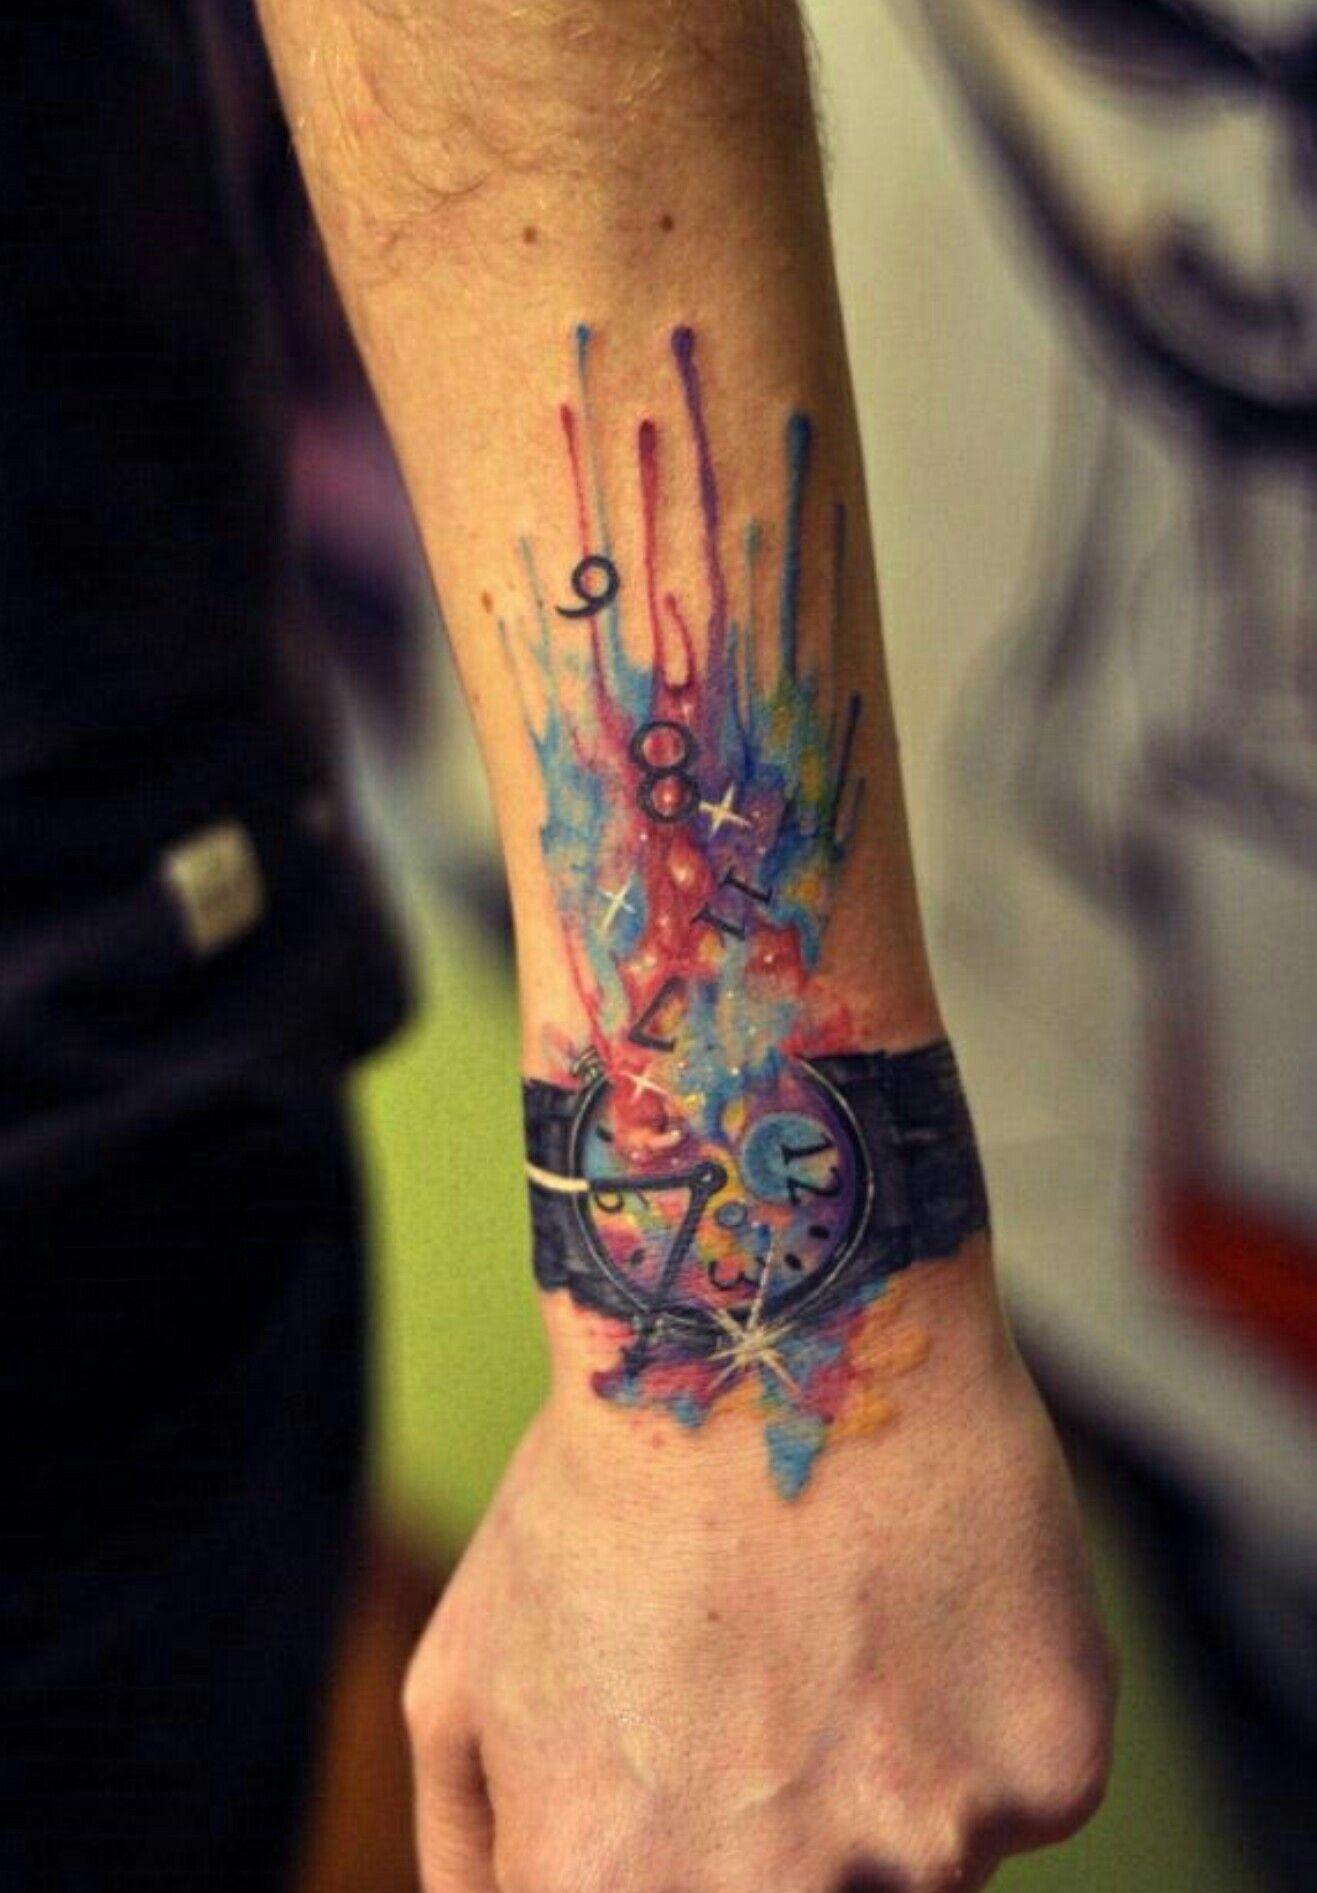 Pin By Jessyka Pedroza On Tattoos Pinterest Tatuajes Artistas